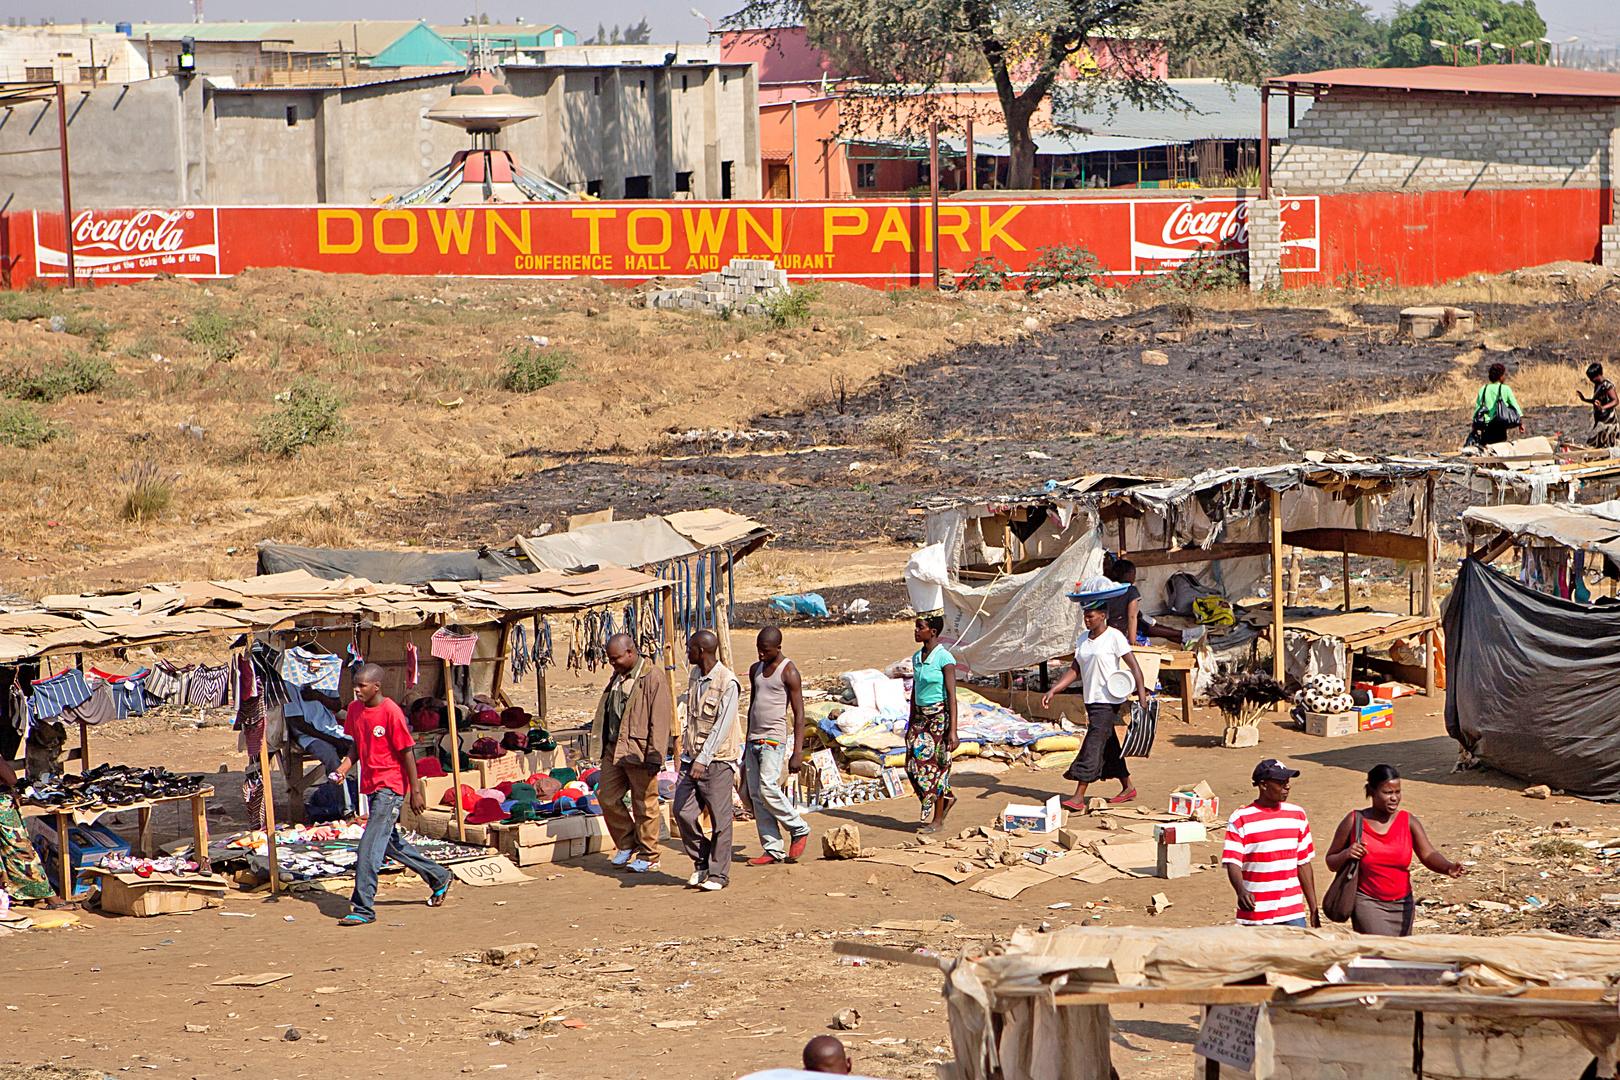 Down Town Park